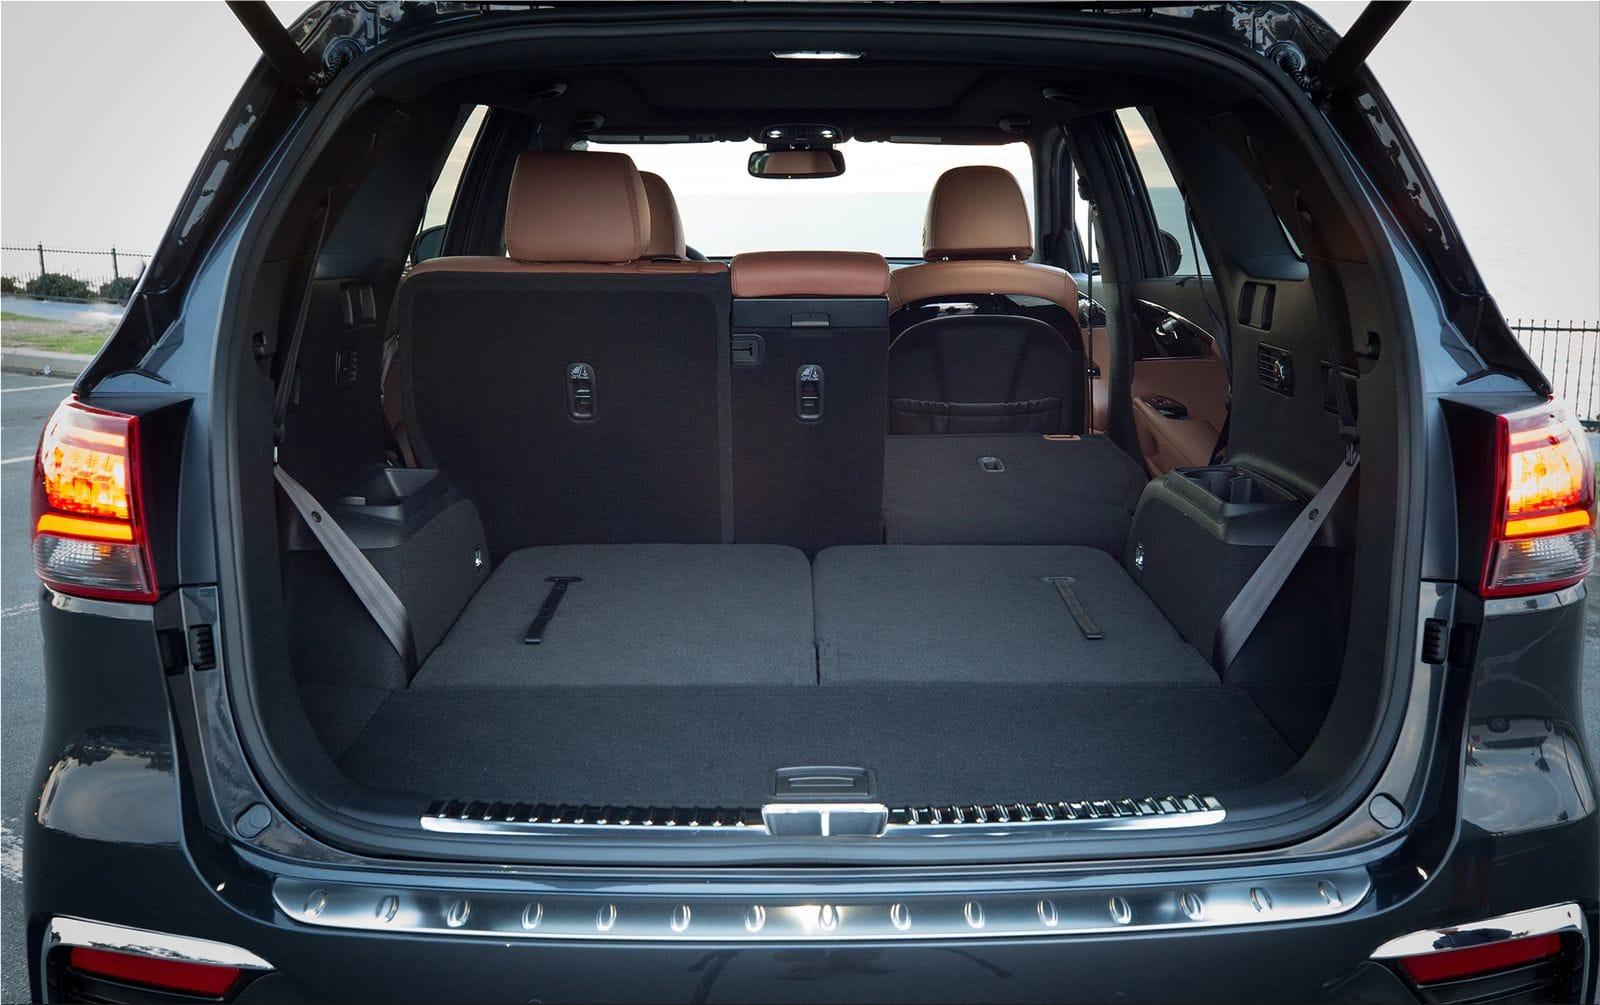 2019 kia sorento available from 25 990 kia car pictures. Black Bedroom Furniture Sets. Home Design Ideas